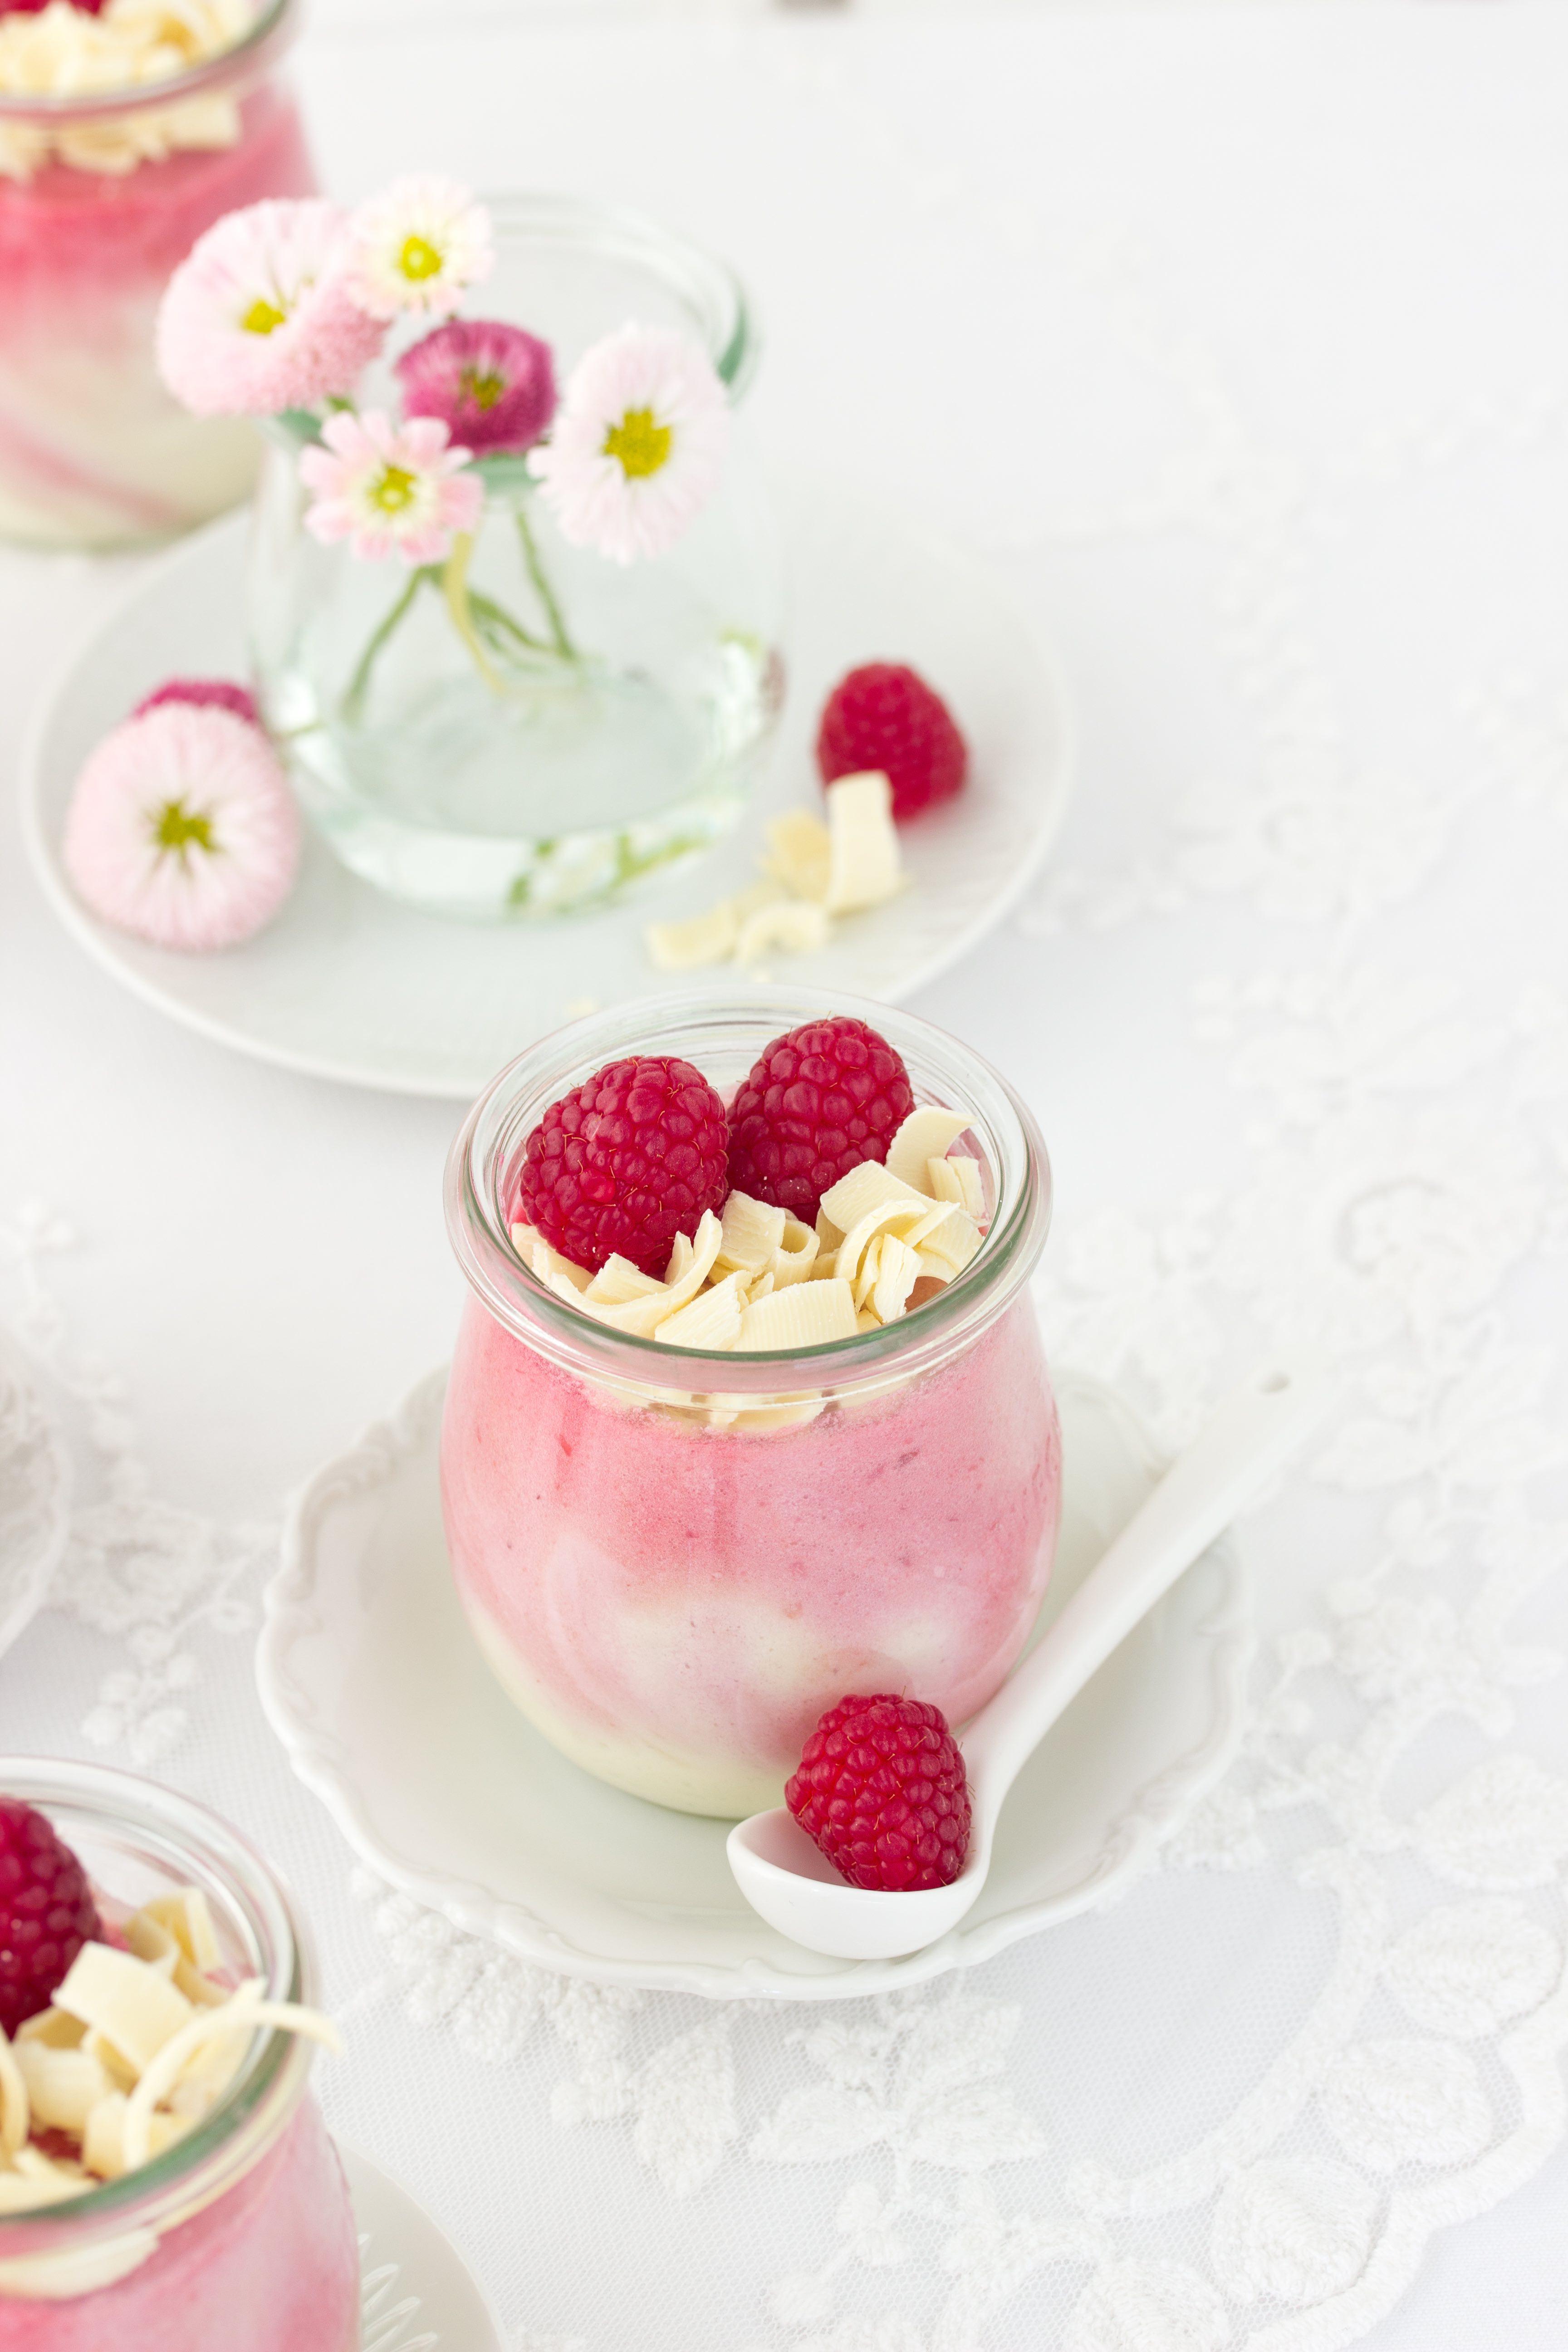 Rezept: Weiße Schokolade Himbeer Mousse zum Muttertag oder einfach so zum Dessert #himbeeren #dessert #mousse | Emma´s Lieblingsstücke